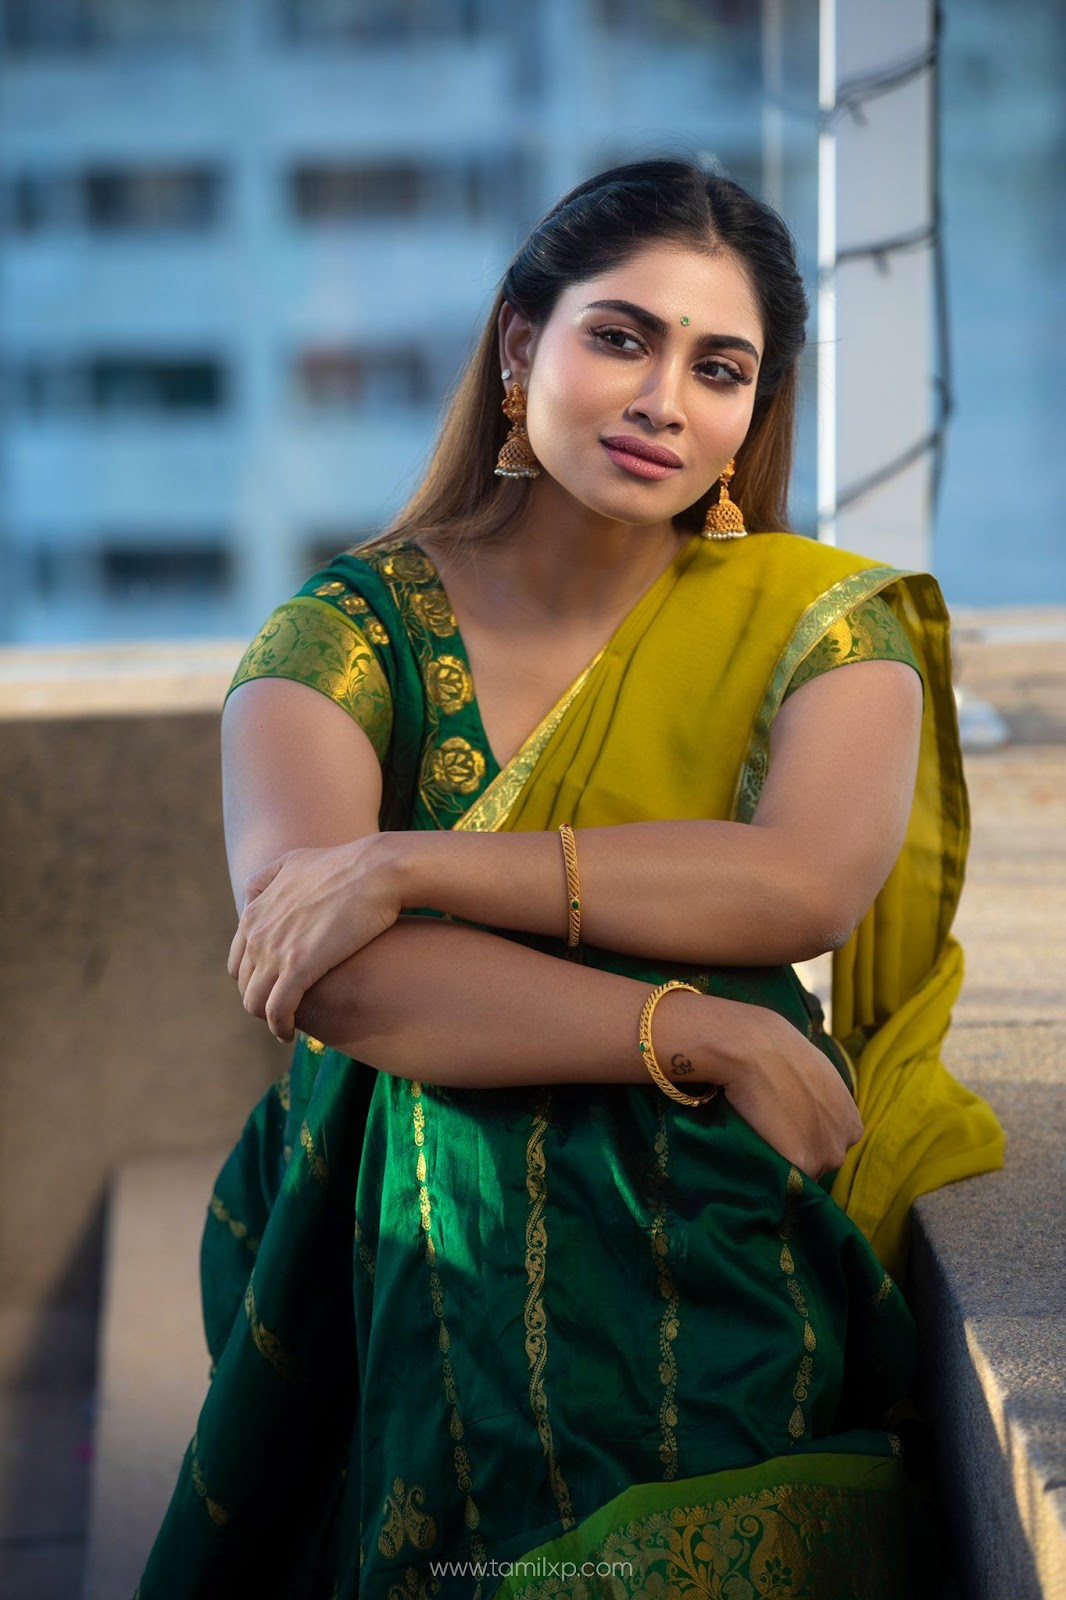 shivani narayanan latest images